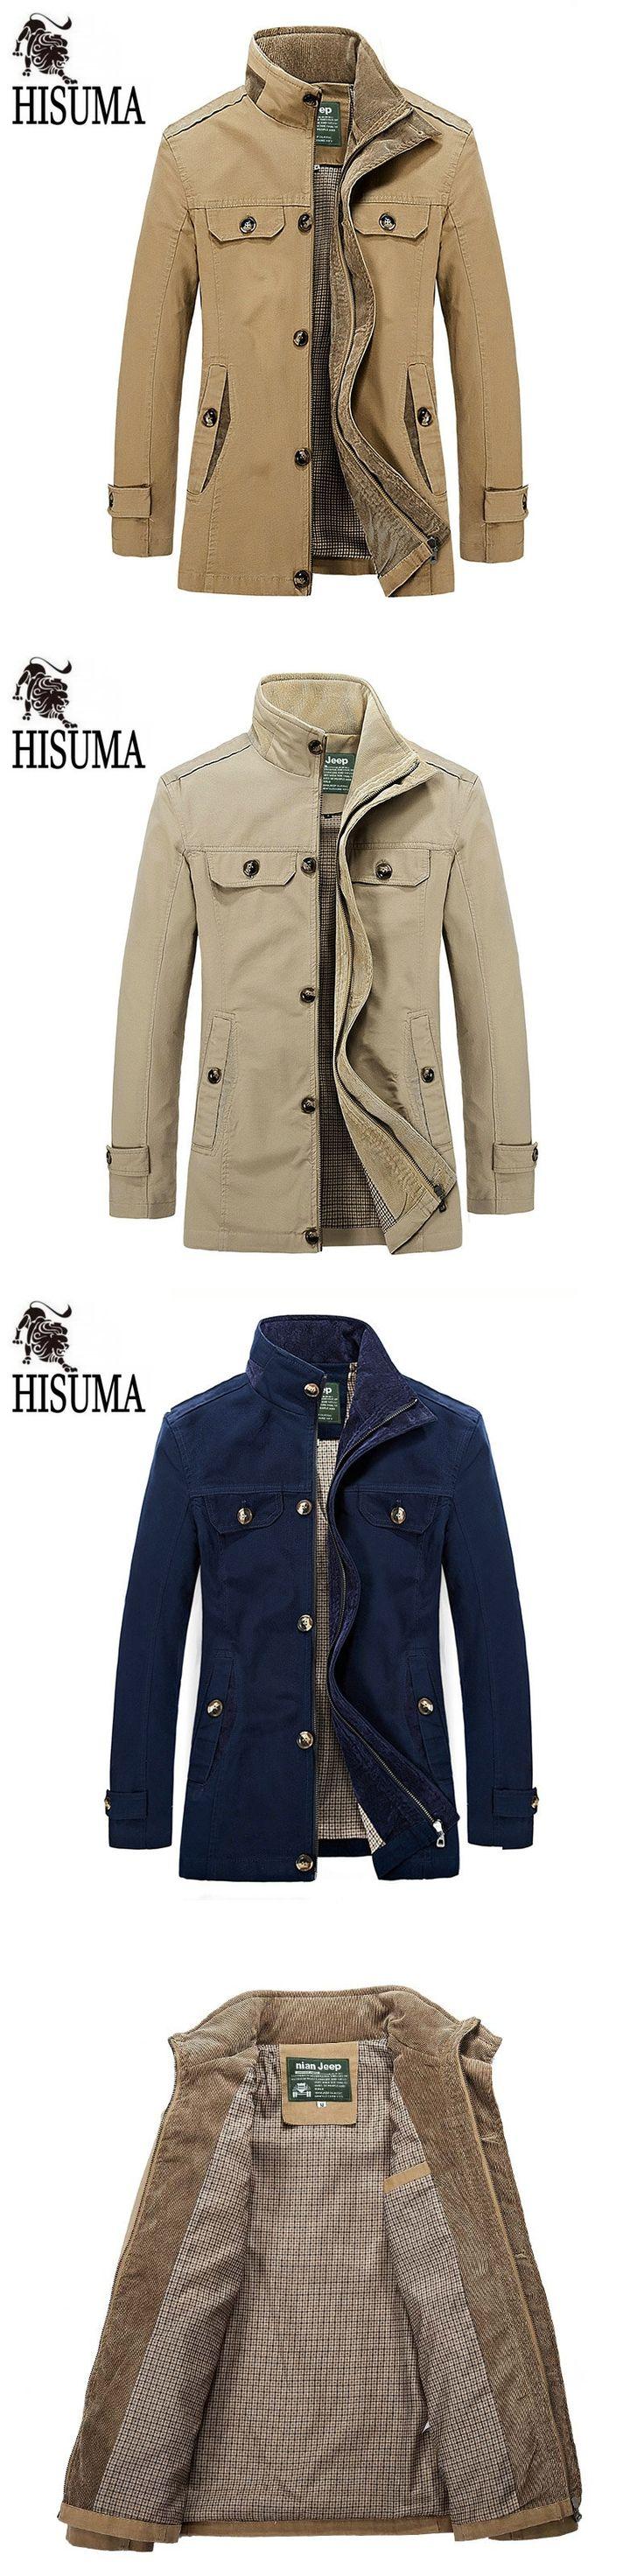 2016 autumn winter new men's Corduroy jacket stand collar male fashion Slim jackets mens casual jackets Outerwear men Coat M-4XL